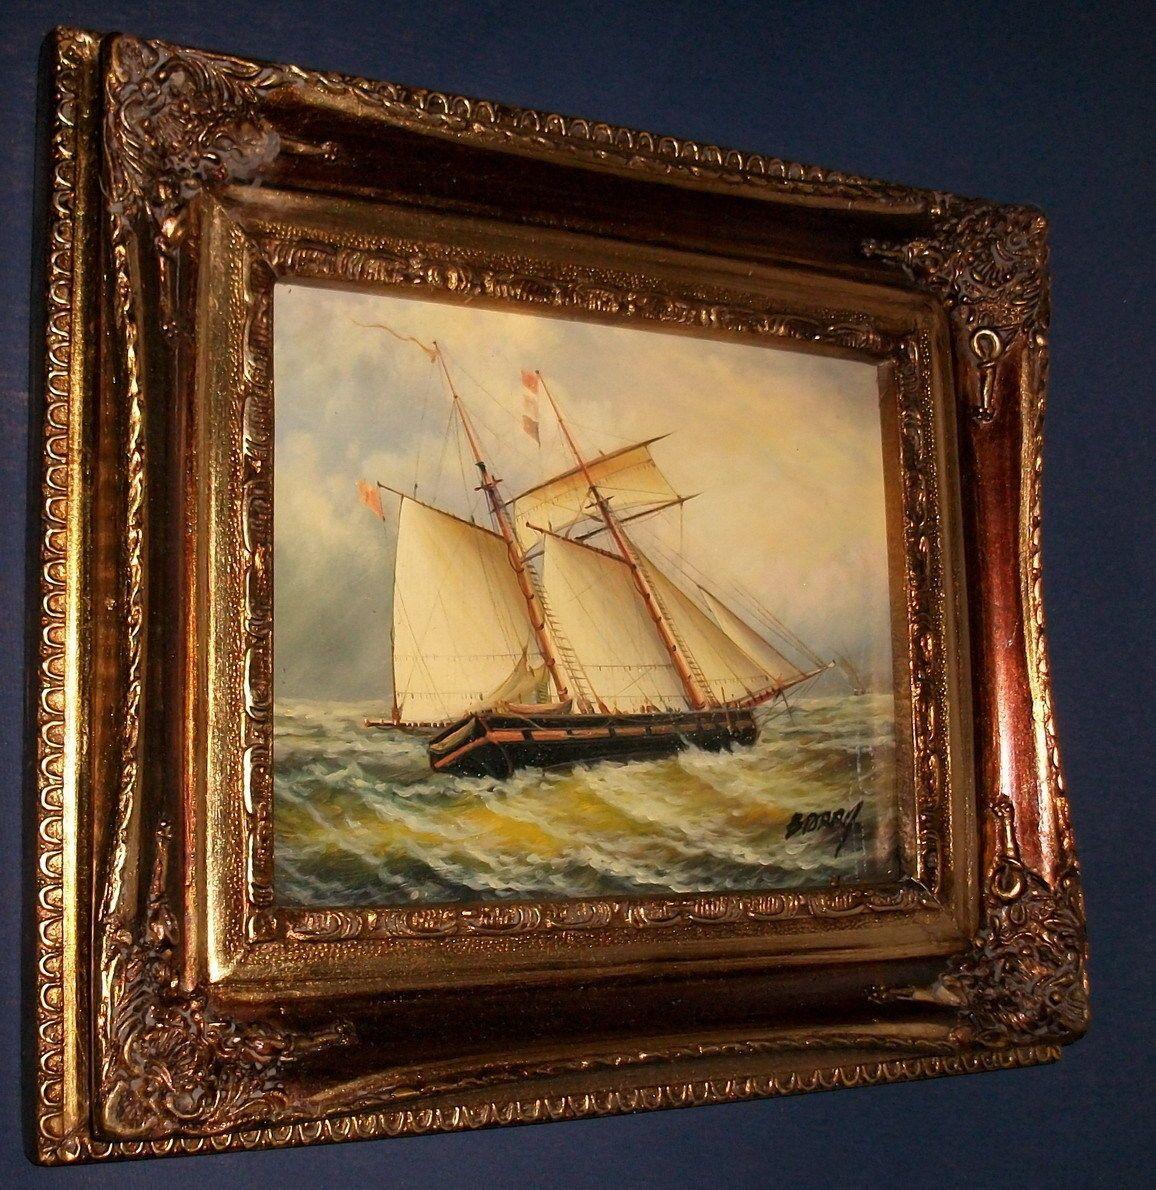 Ölgemälde-Gemälde-Bild-Ölbild-Segler-Segelschiff-Segelboot-Rahmen-Barock de.picclick.com